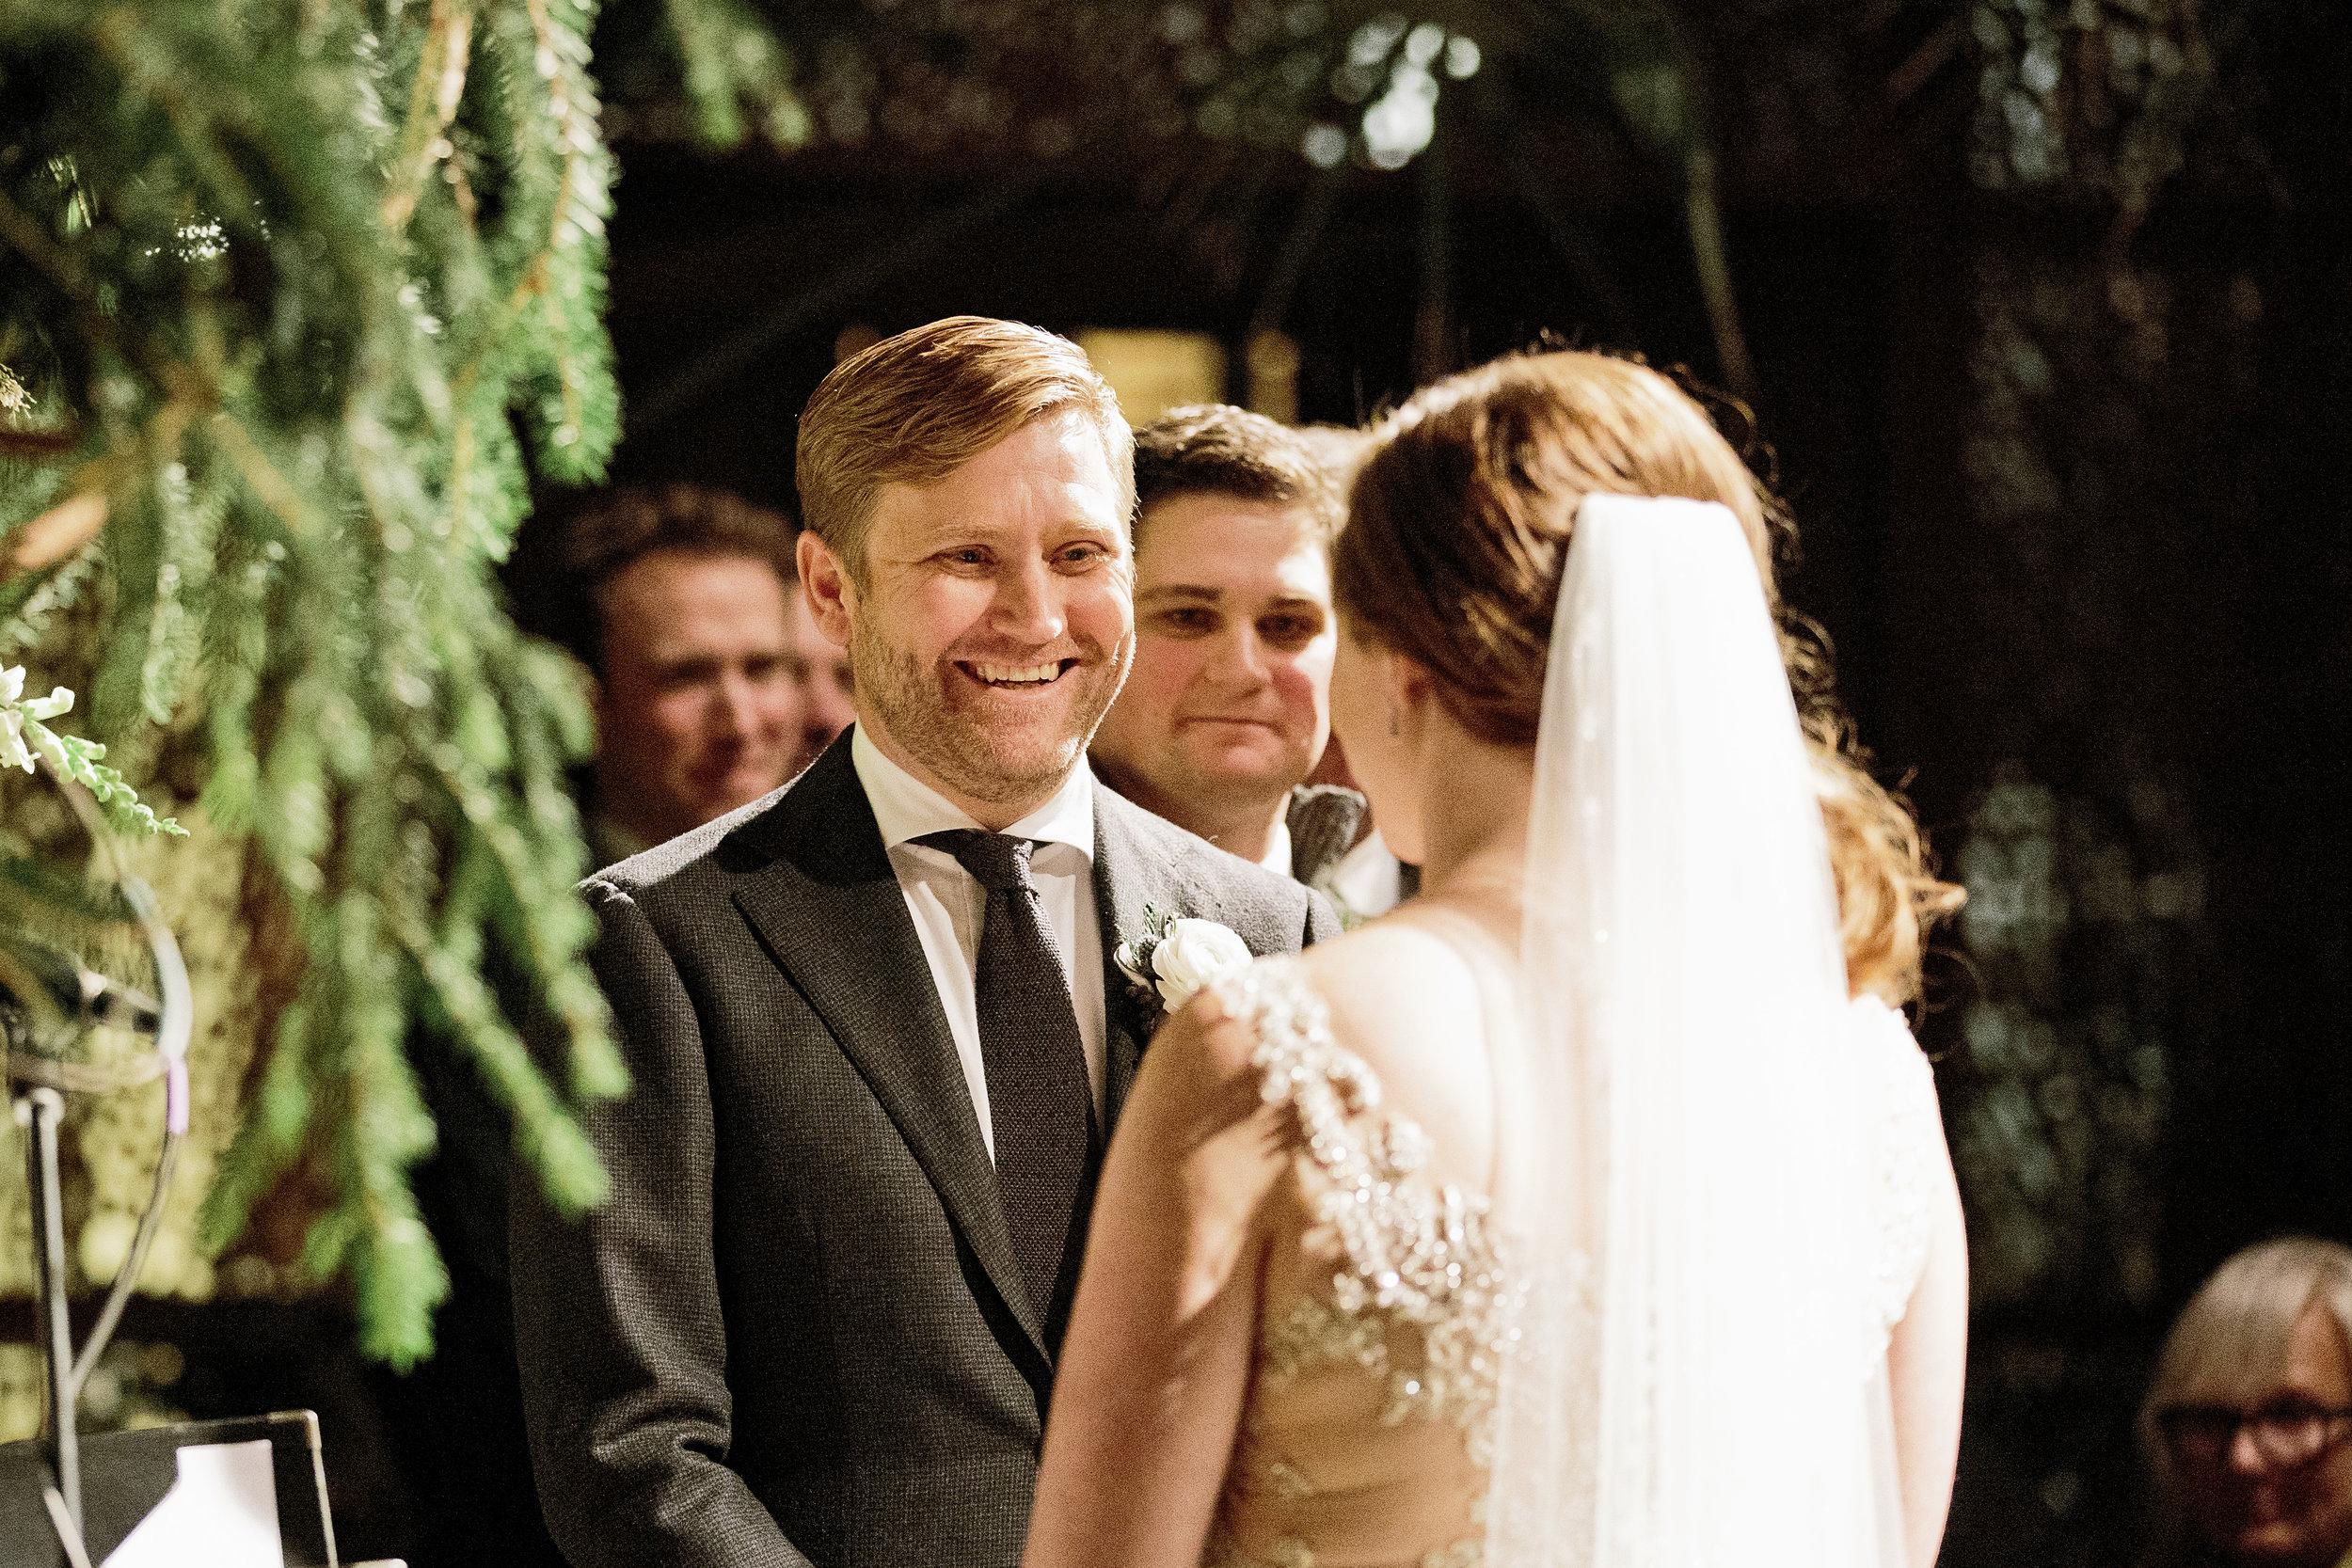 Hudson-Nichols-Martha-Stewart-Weddings-Winter-Ski-Philadelphia-Claire-Conner_168.jpg